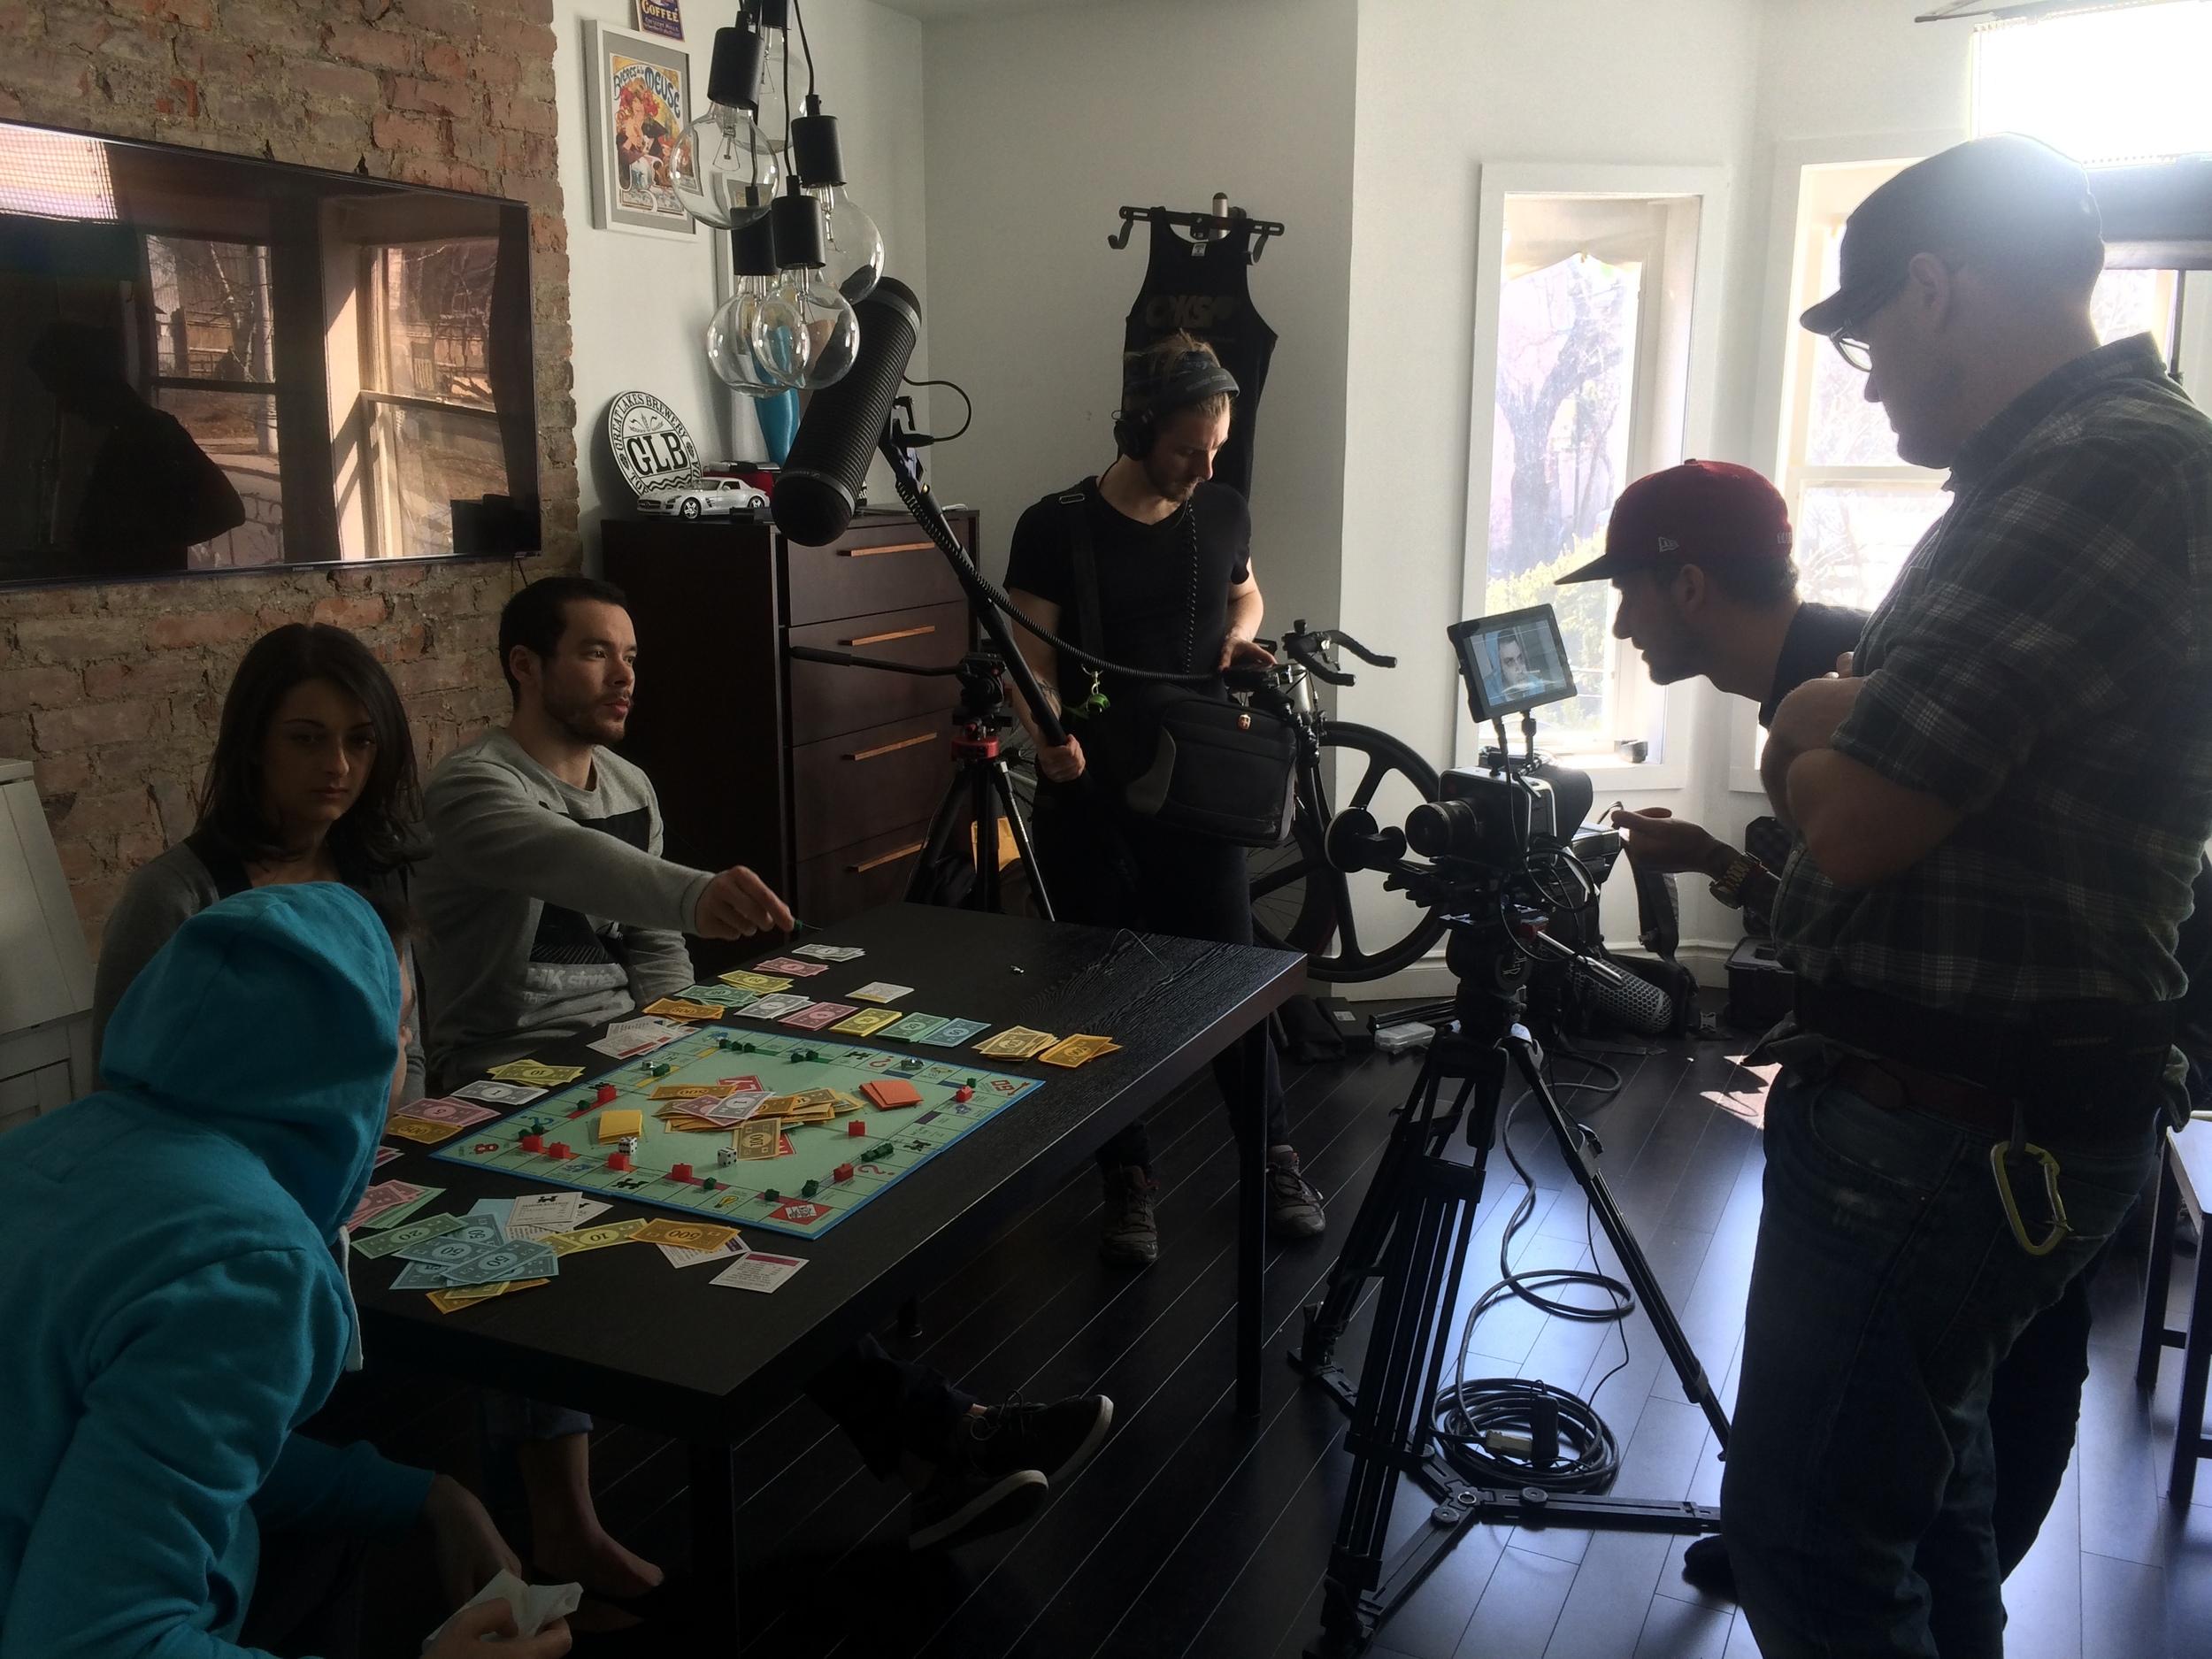 Filming the board game scene.